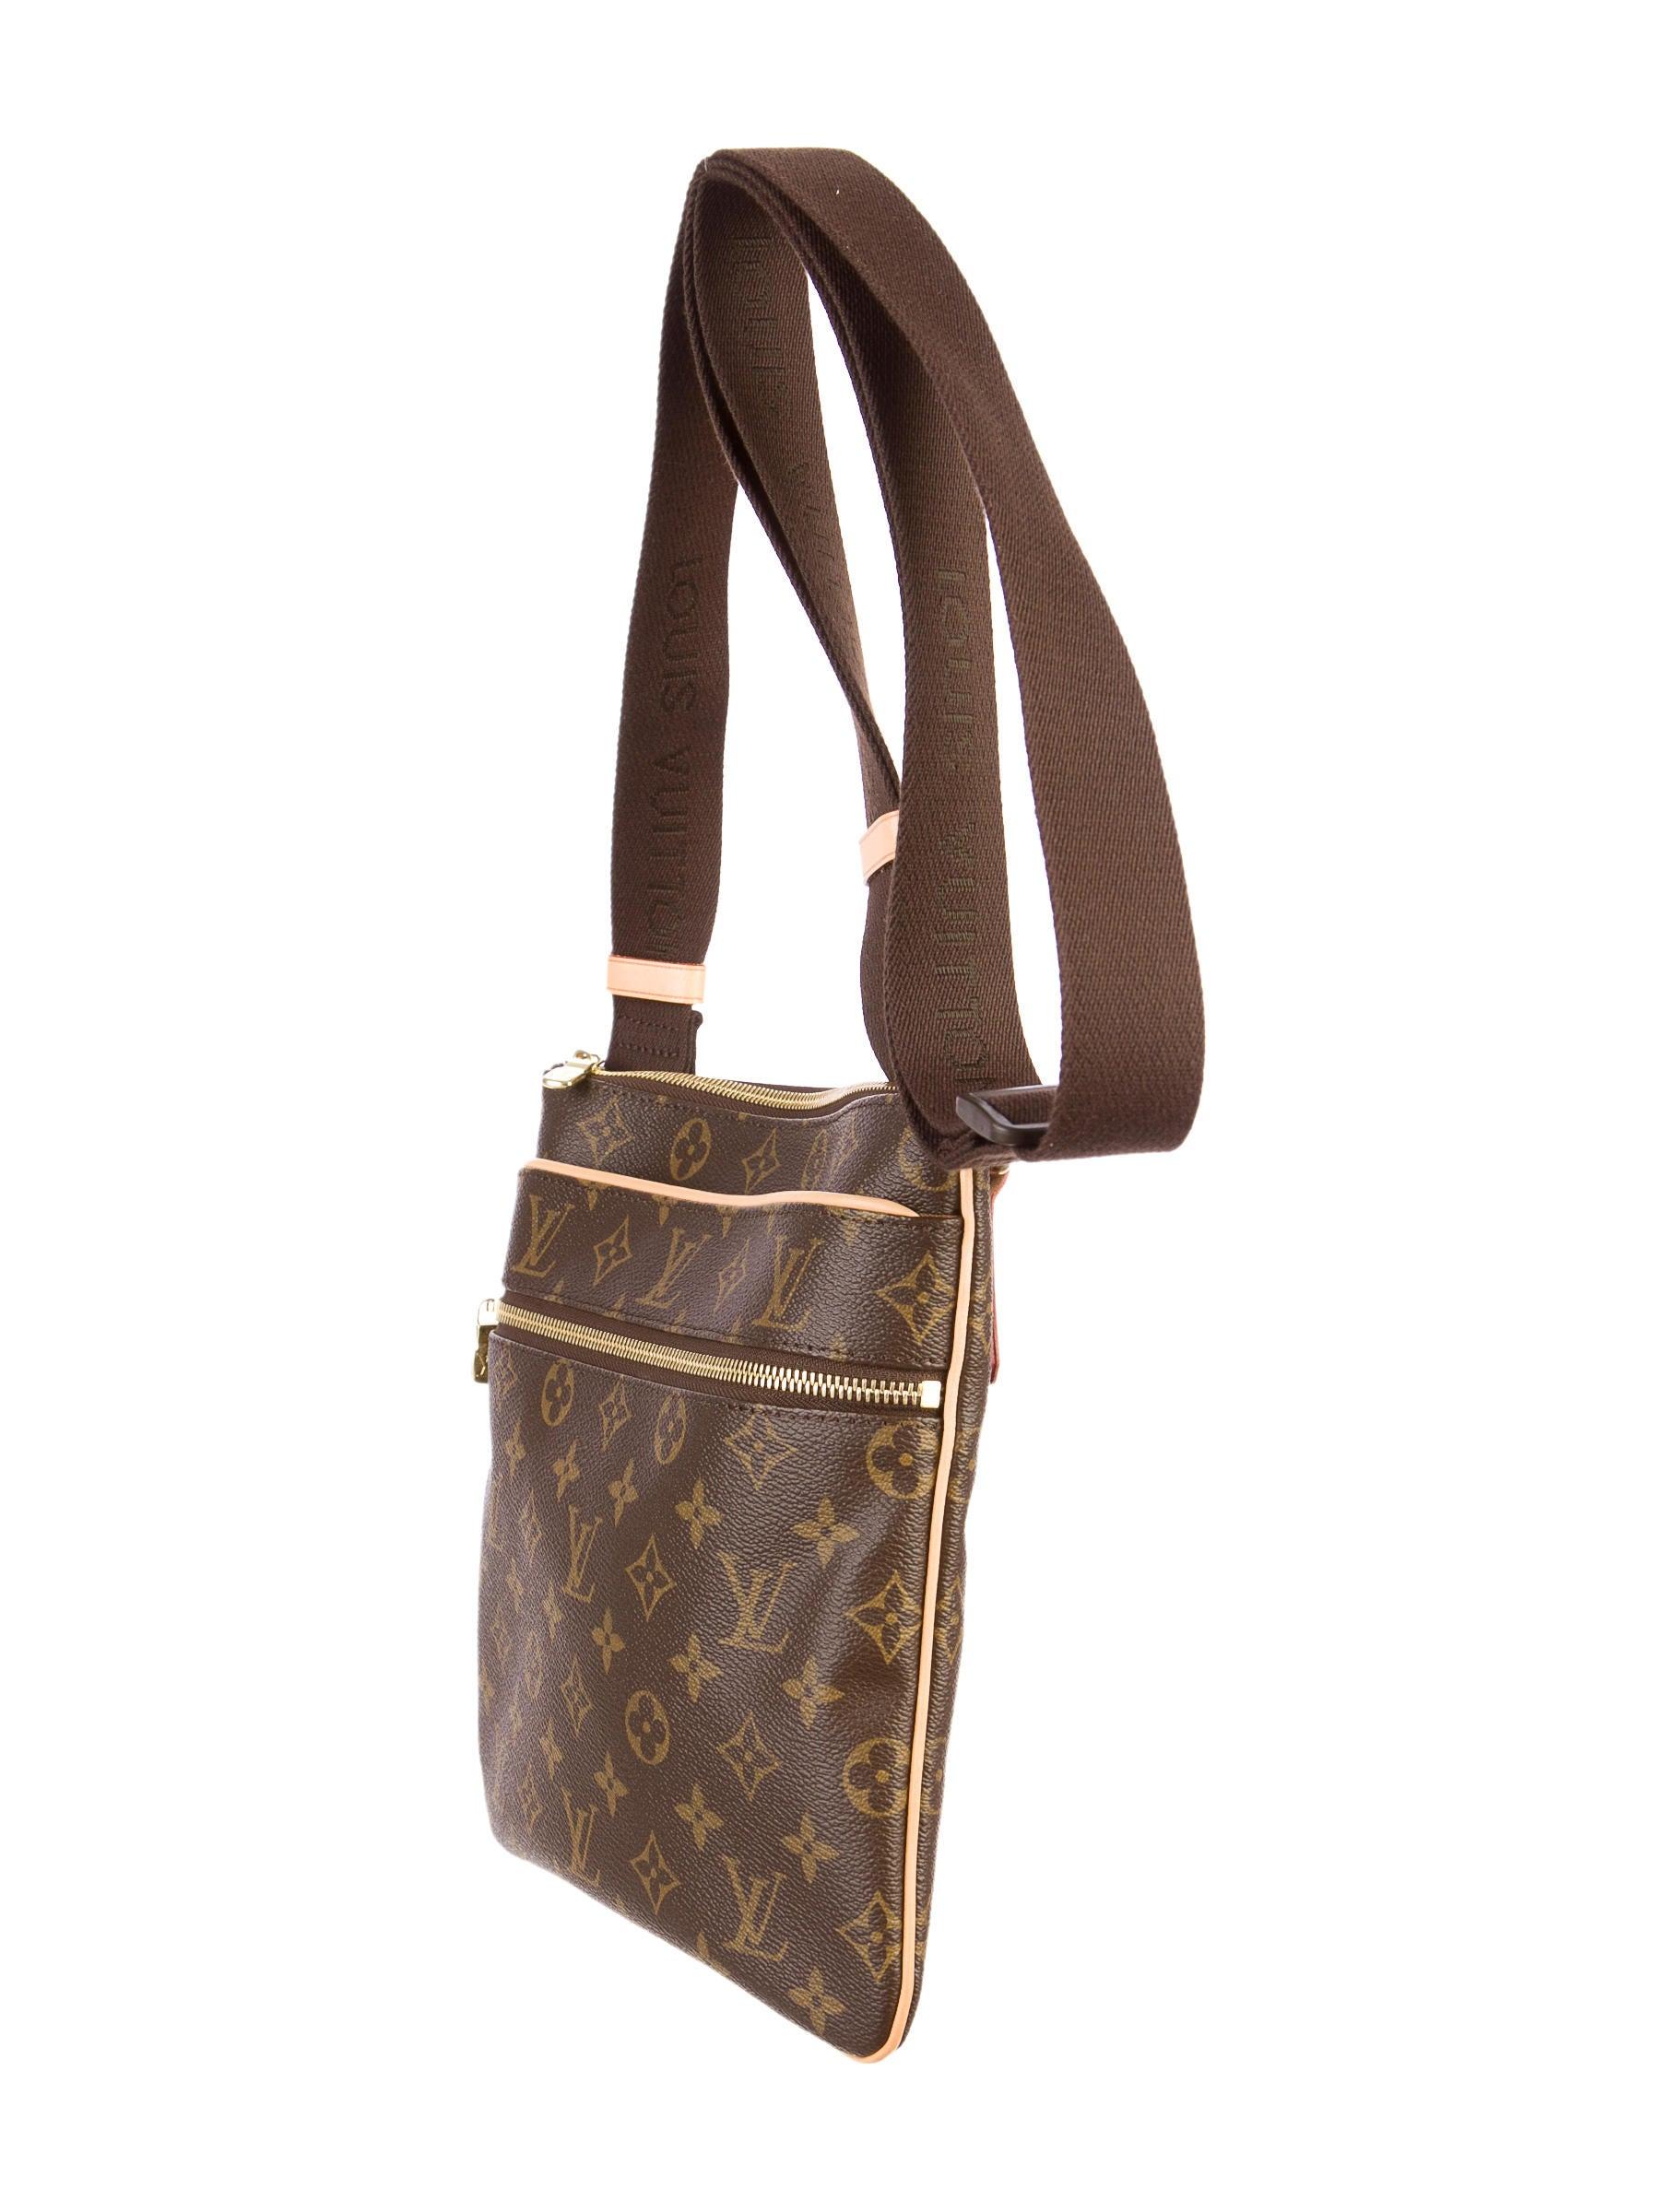 05983eda624f Louis Vuitton Valmy Pochette Bag - Handbags - LOU32426